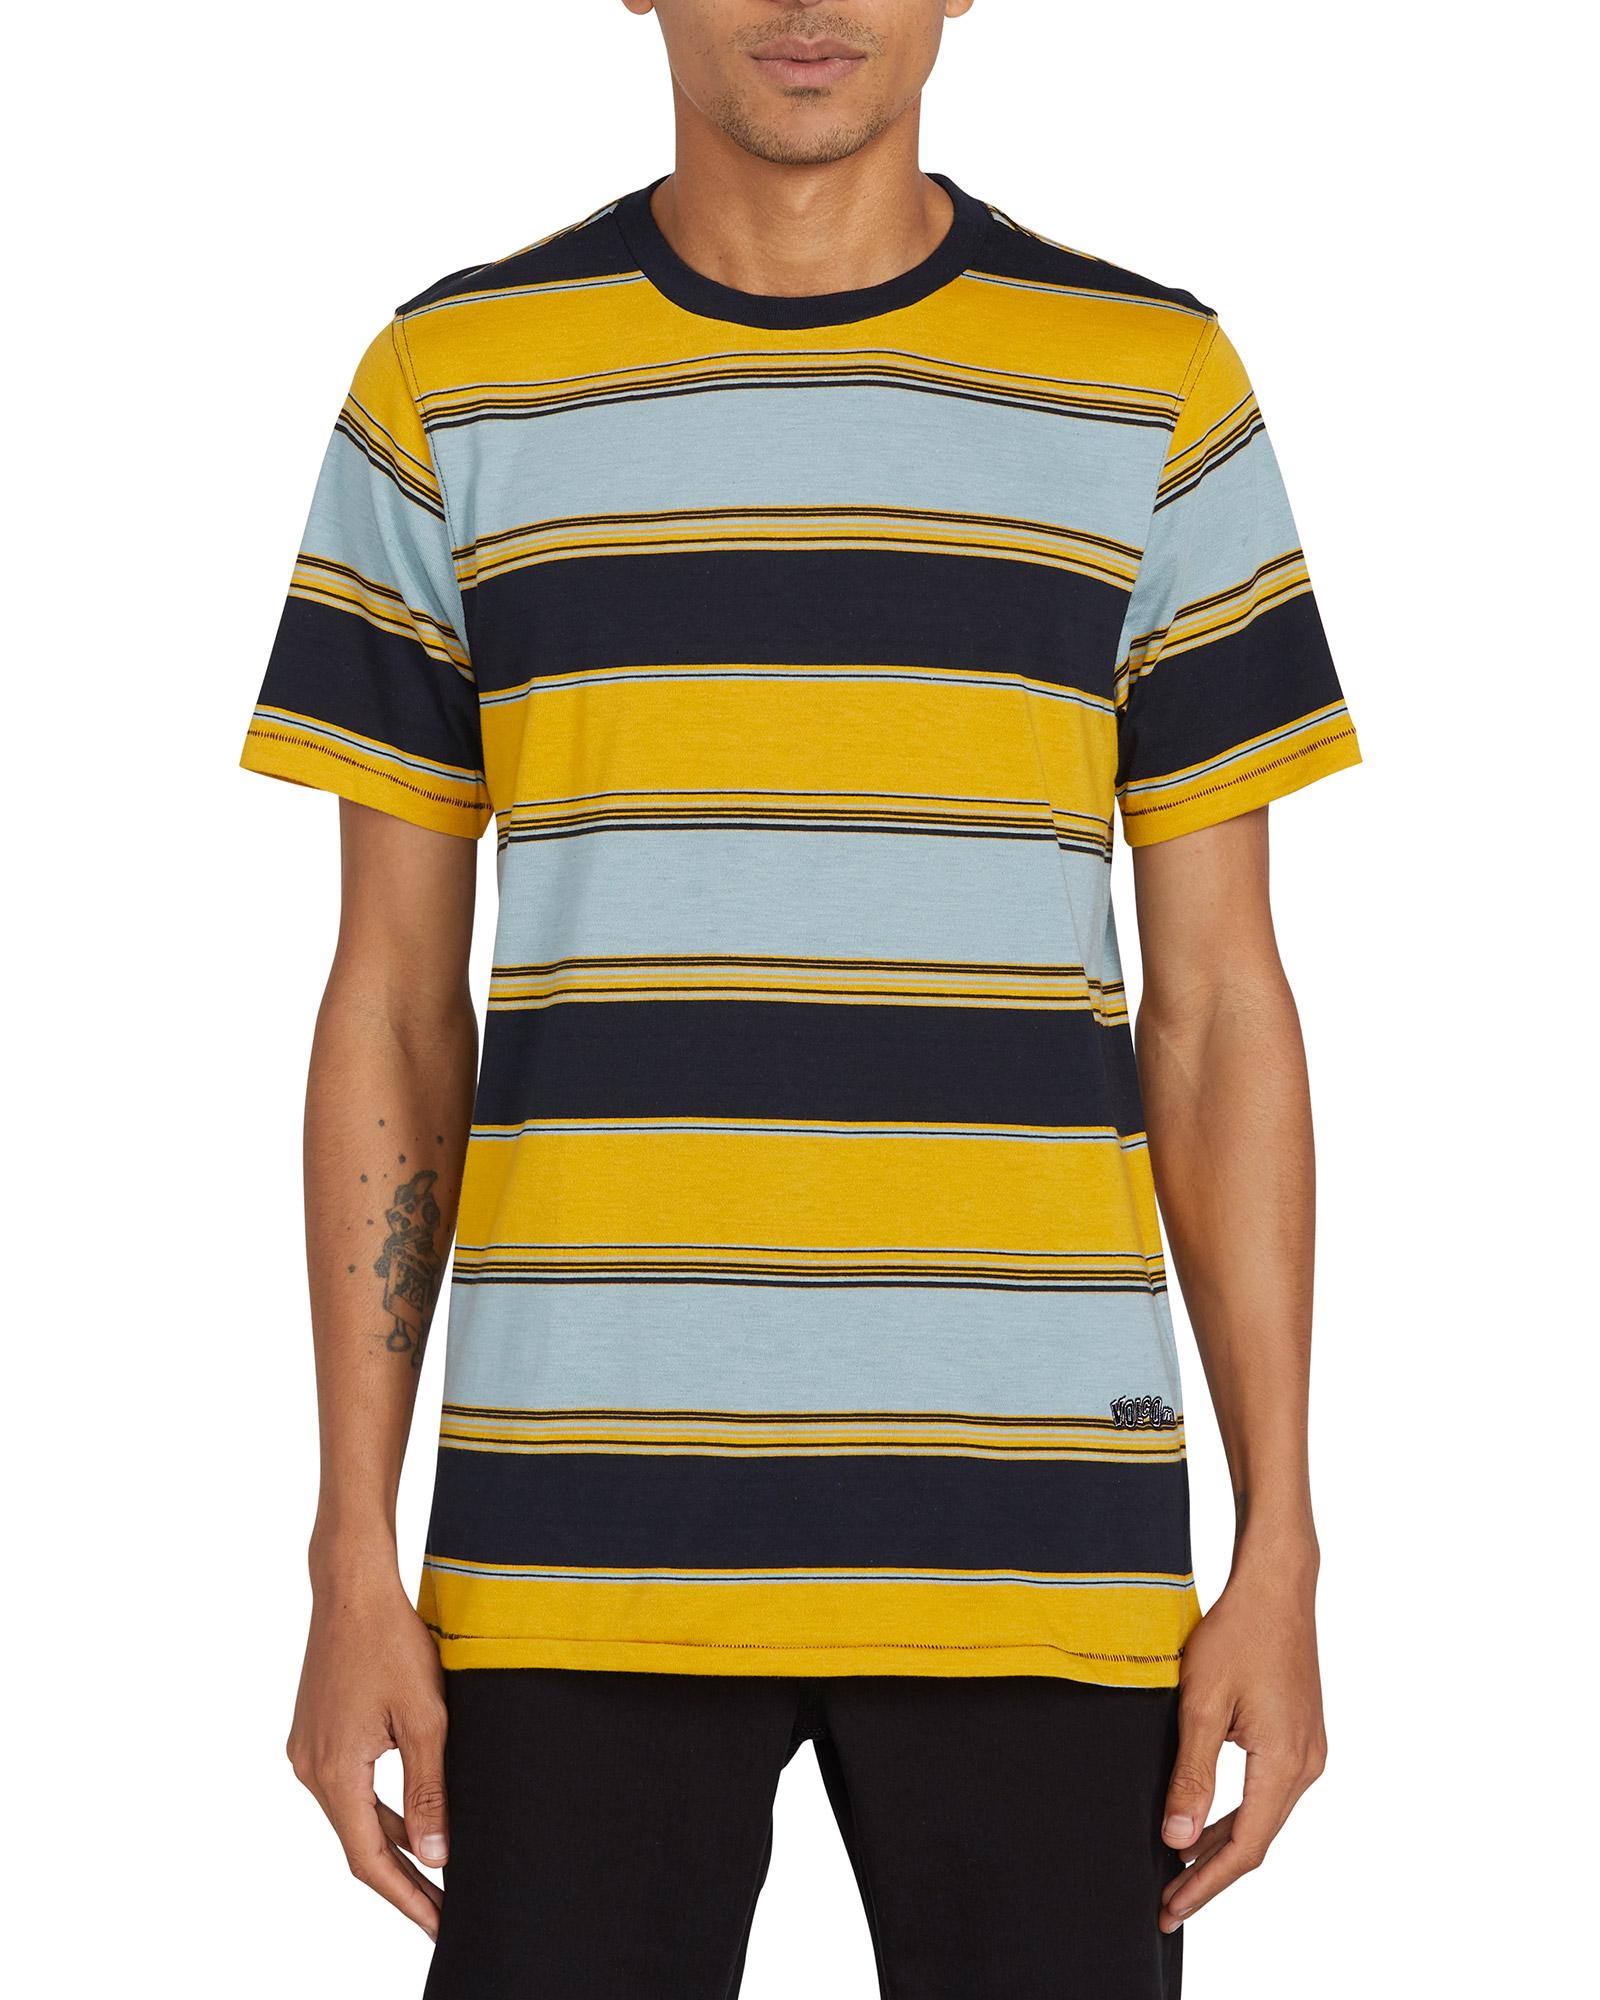 Volcom Men's CJ Collins Short Sleeve T-Shirt 0